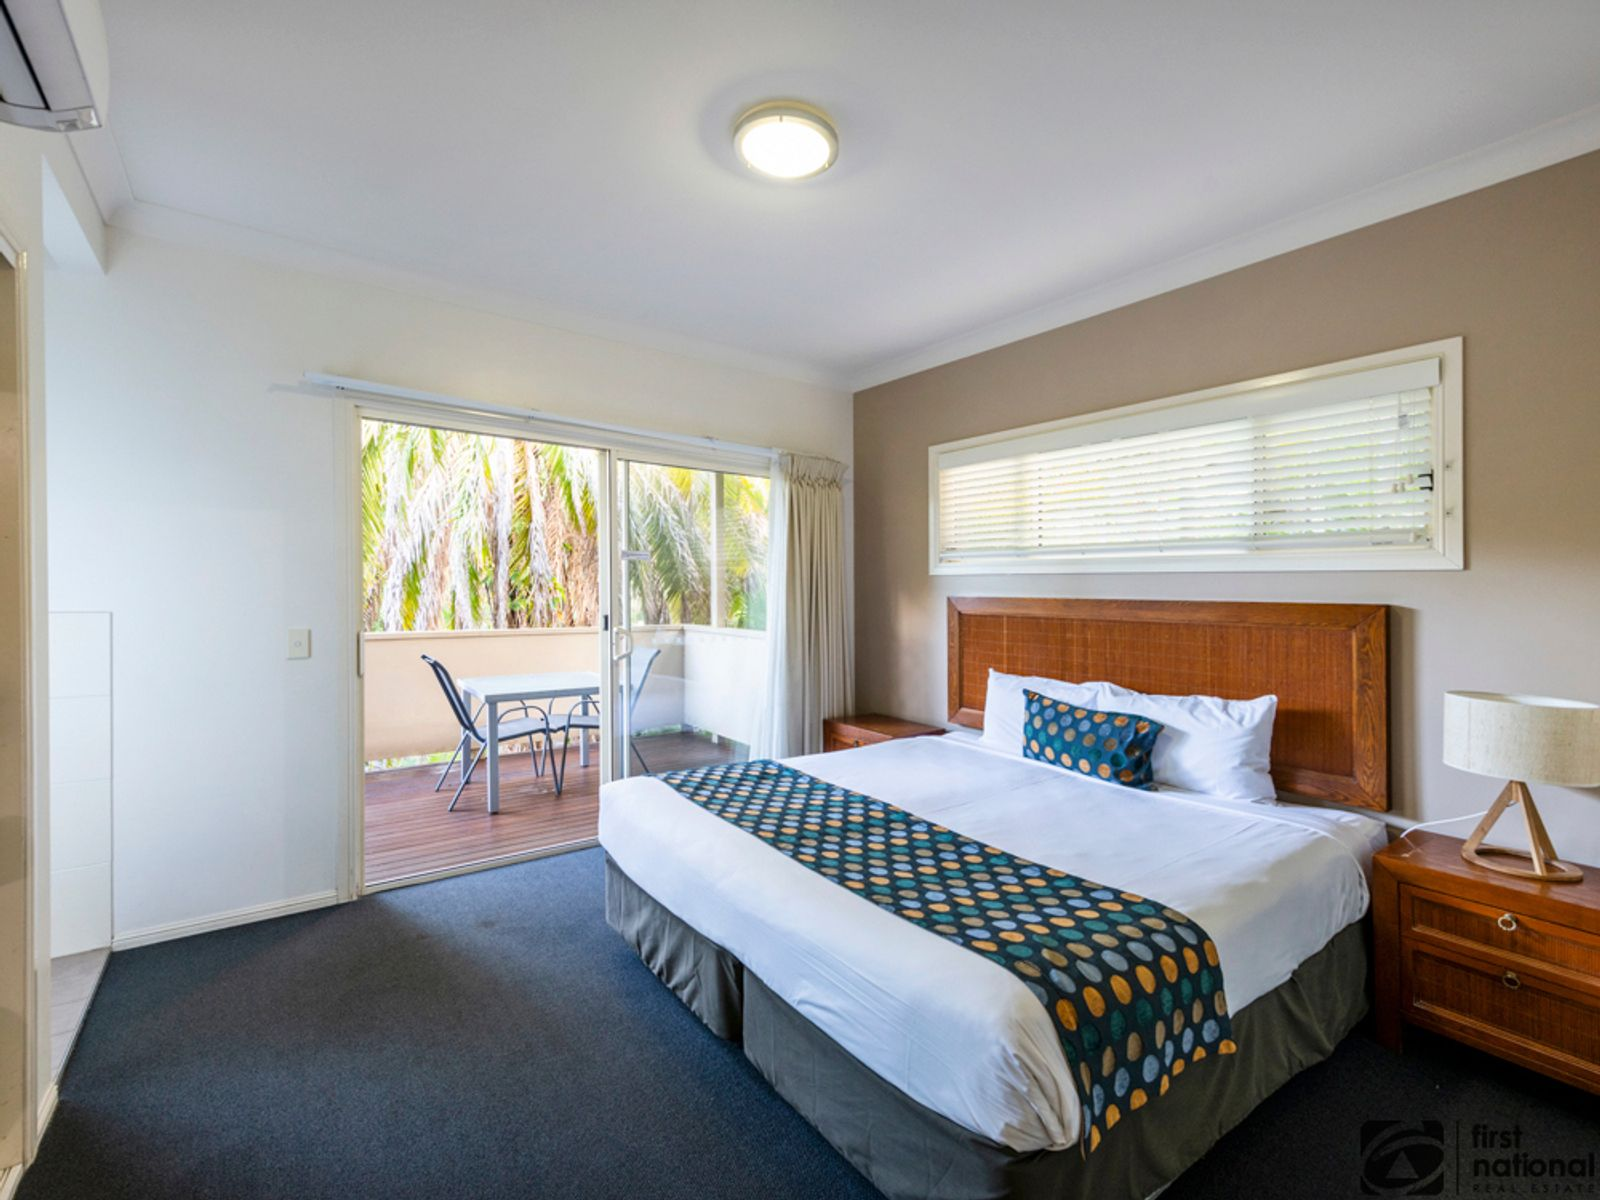 57-57a/11 Firman Drive, Coffs Harbour, NSW 2450